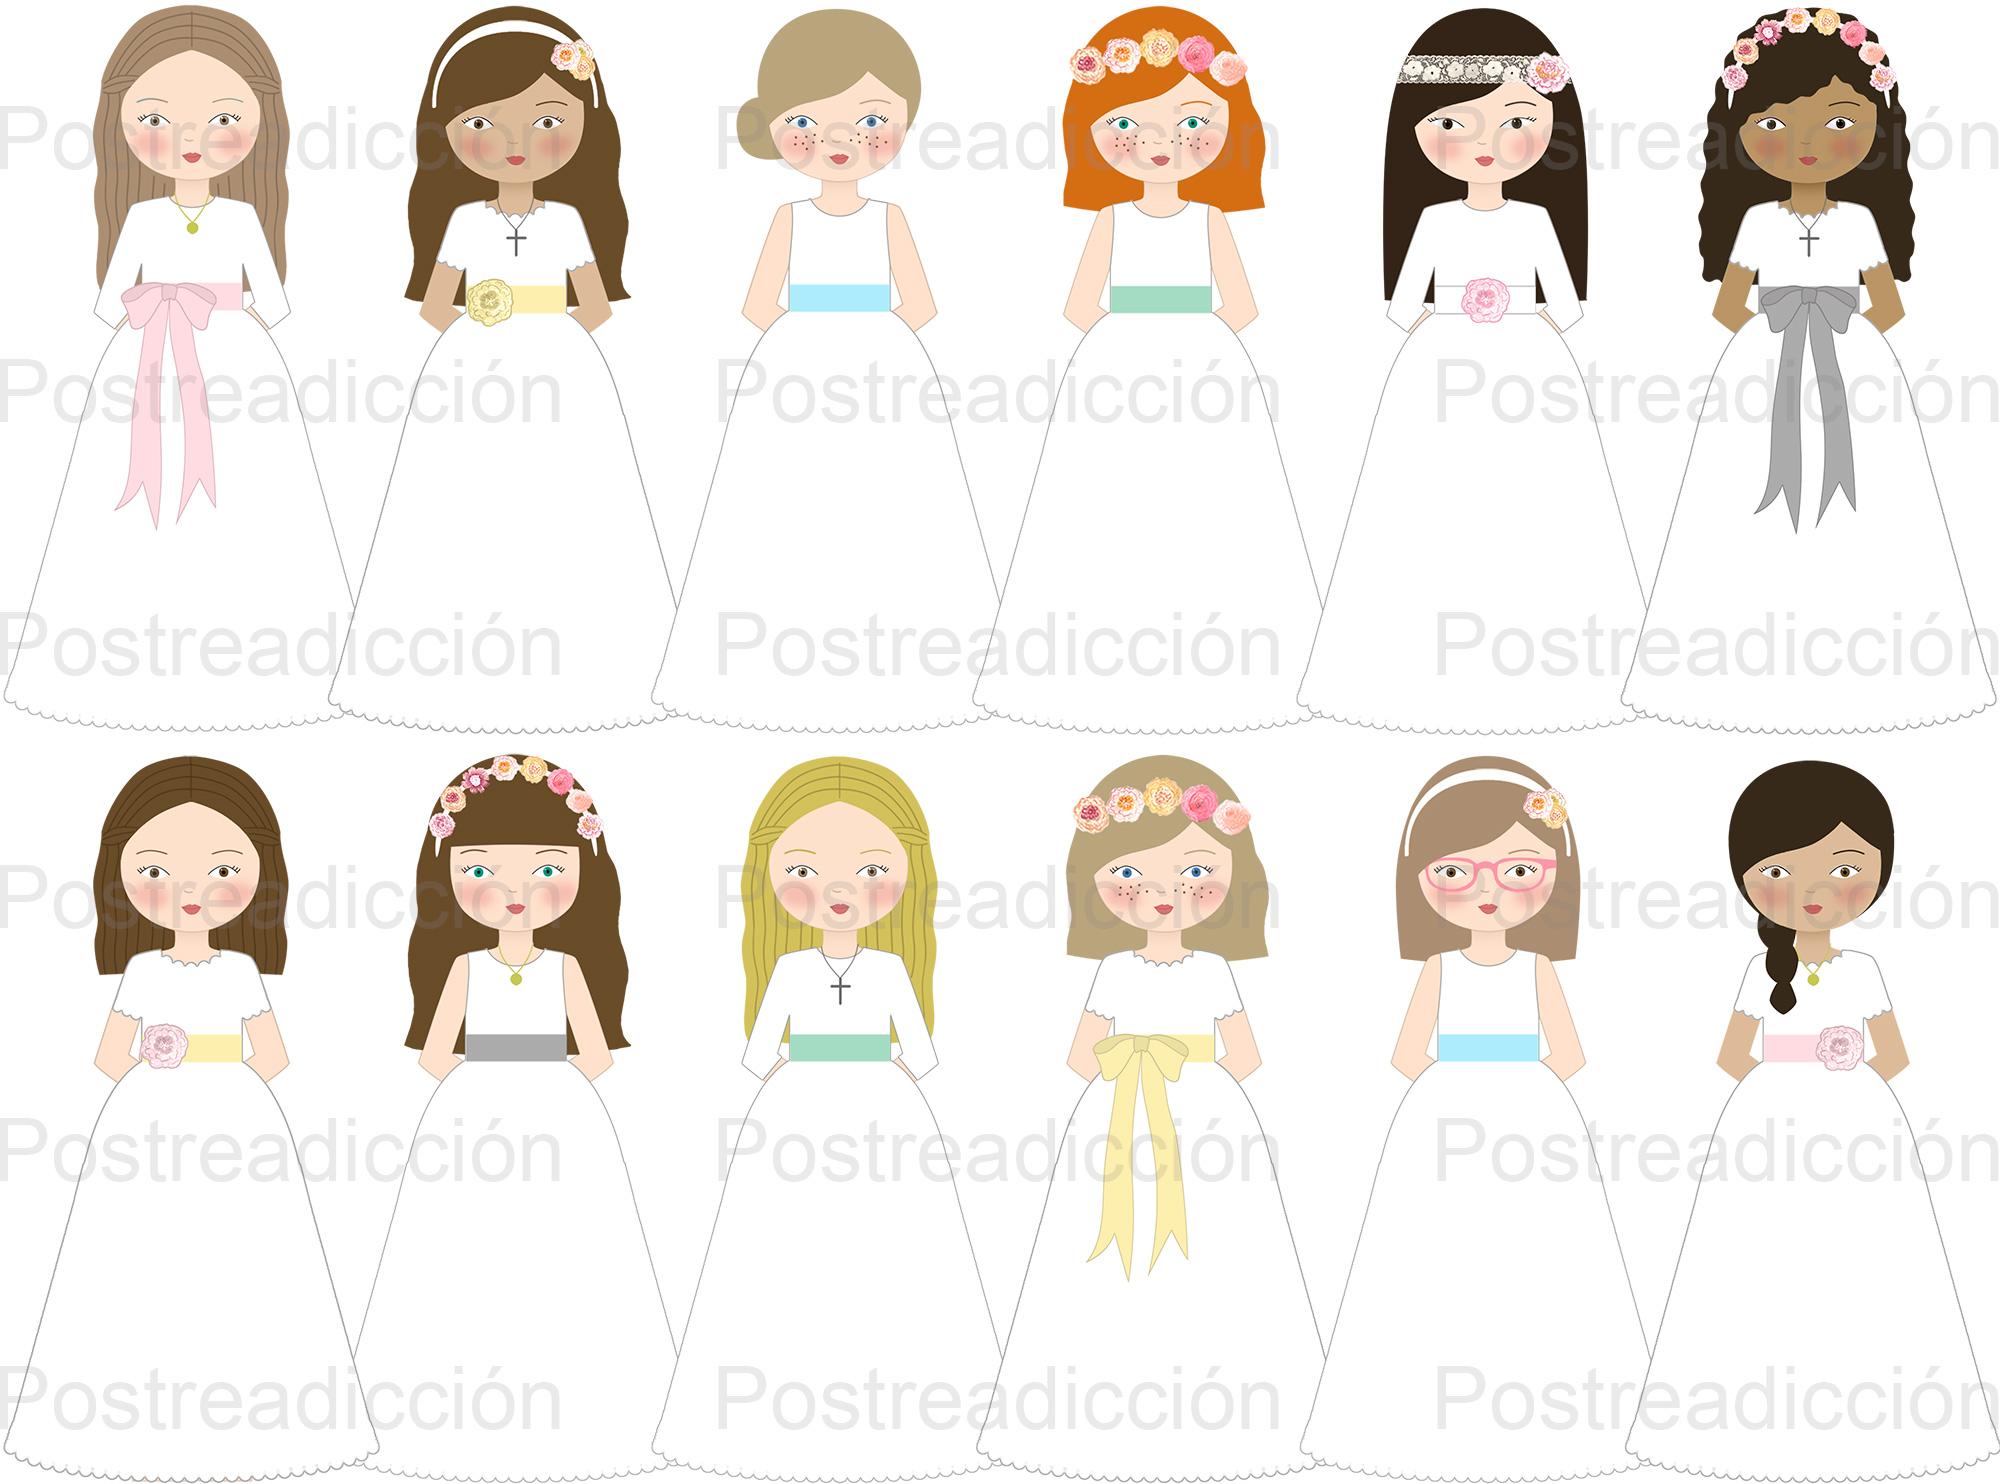 Imagen de producto: https://tienda.postreadiccion.com/img/articulos/secundarias10955-kit-imprimible-de-comunion-carlota-puntitos-rosa-1.jpg